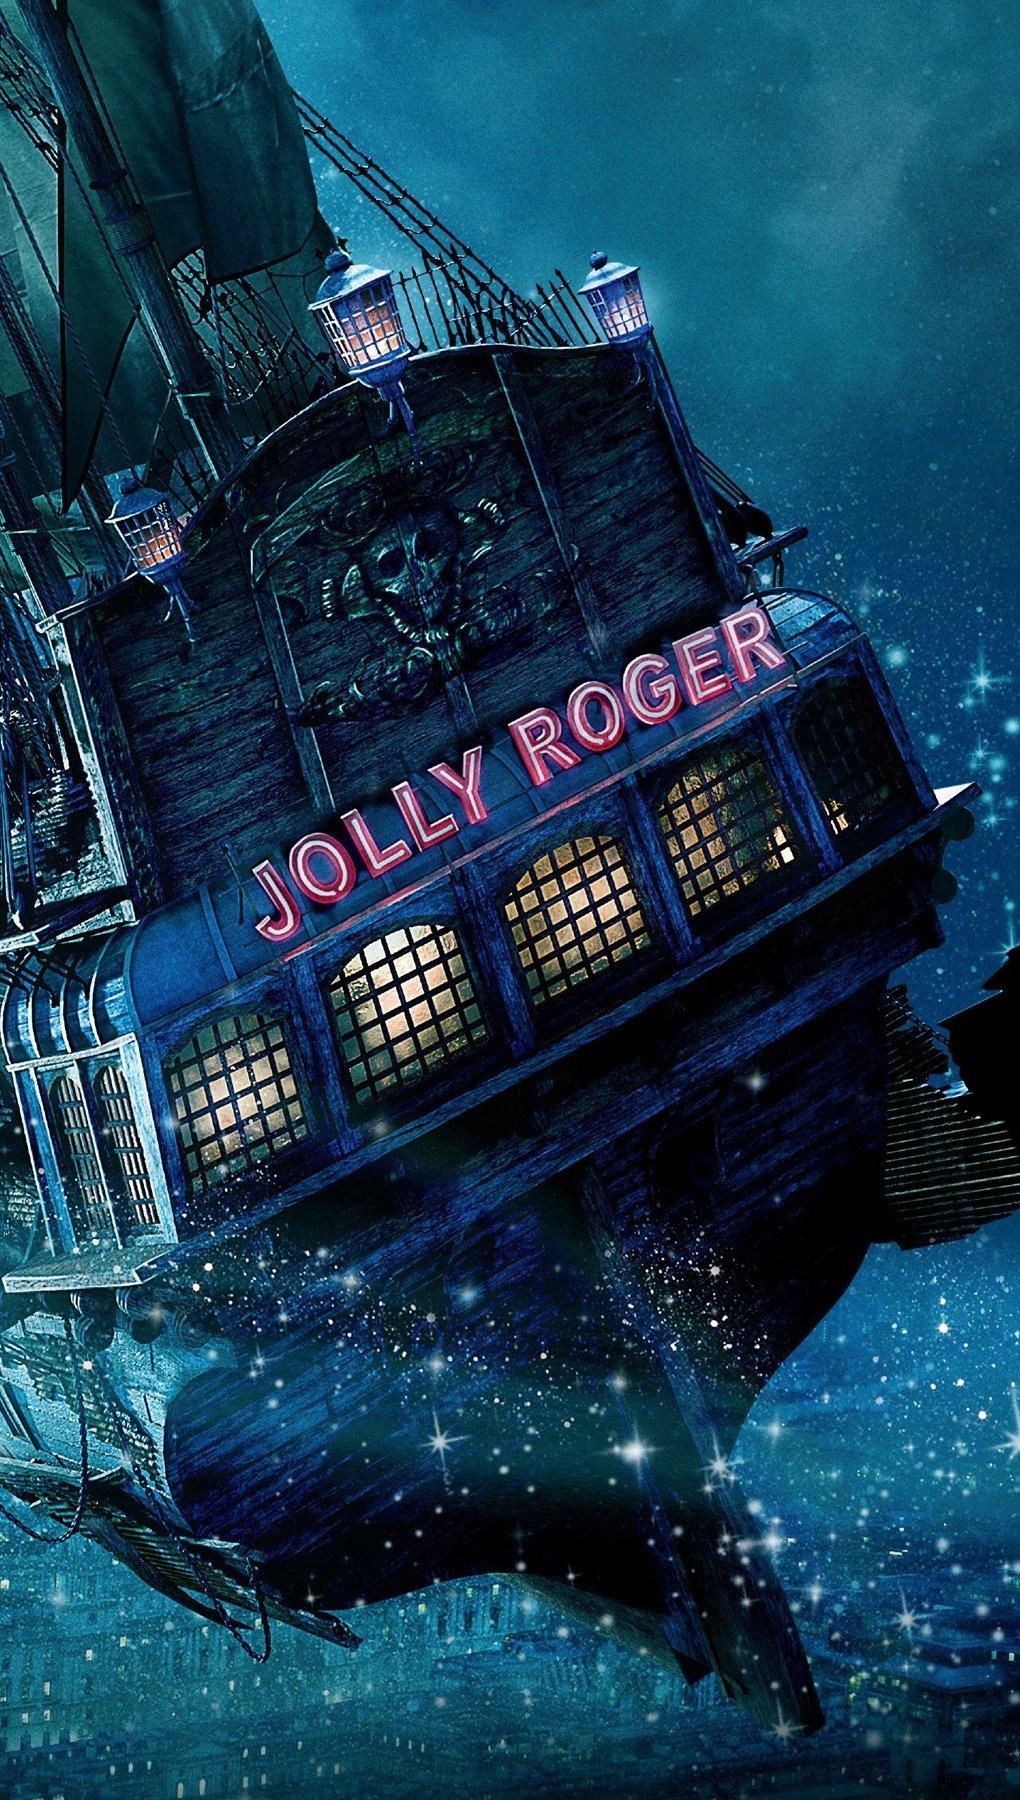 Wallpaper The Jolly Roger ship in Peter Pan Vertical